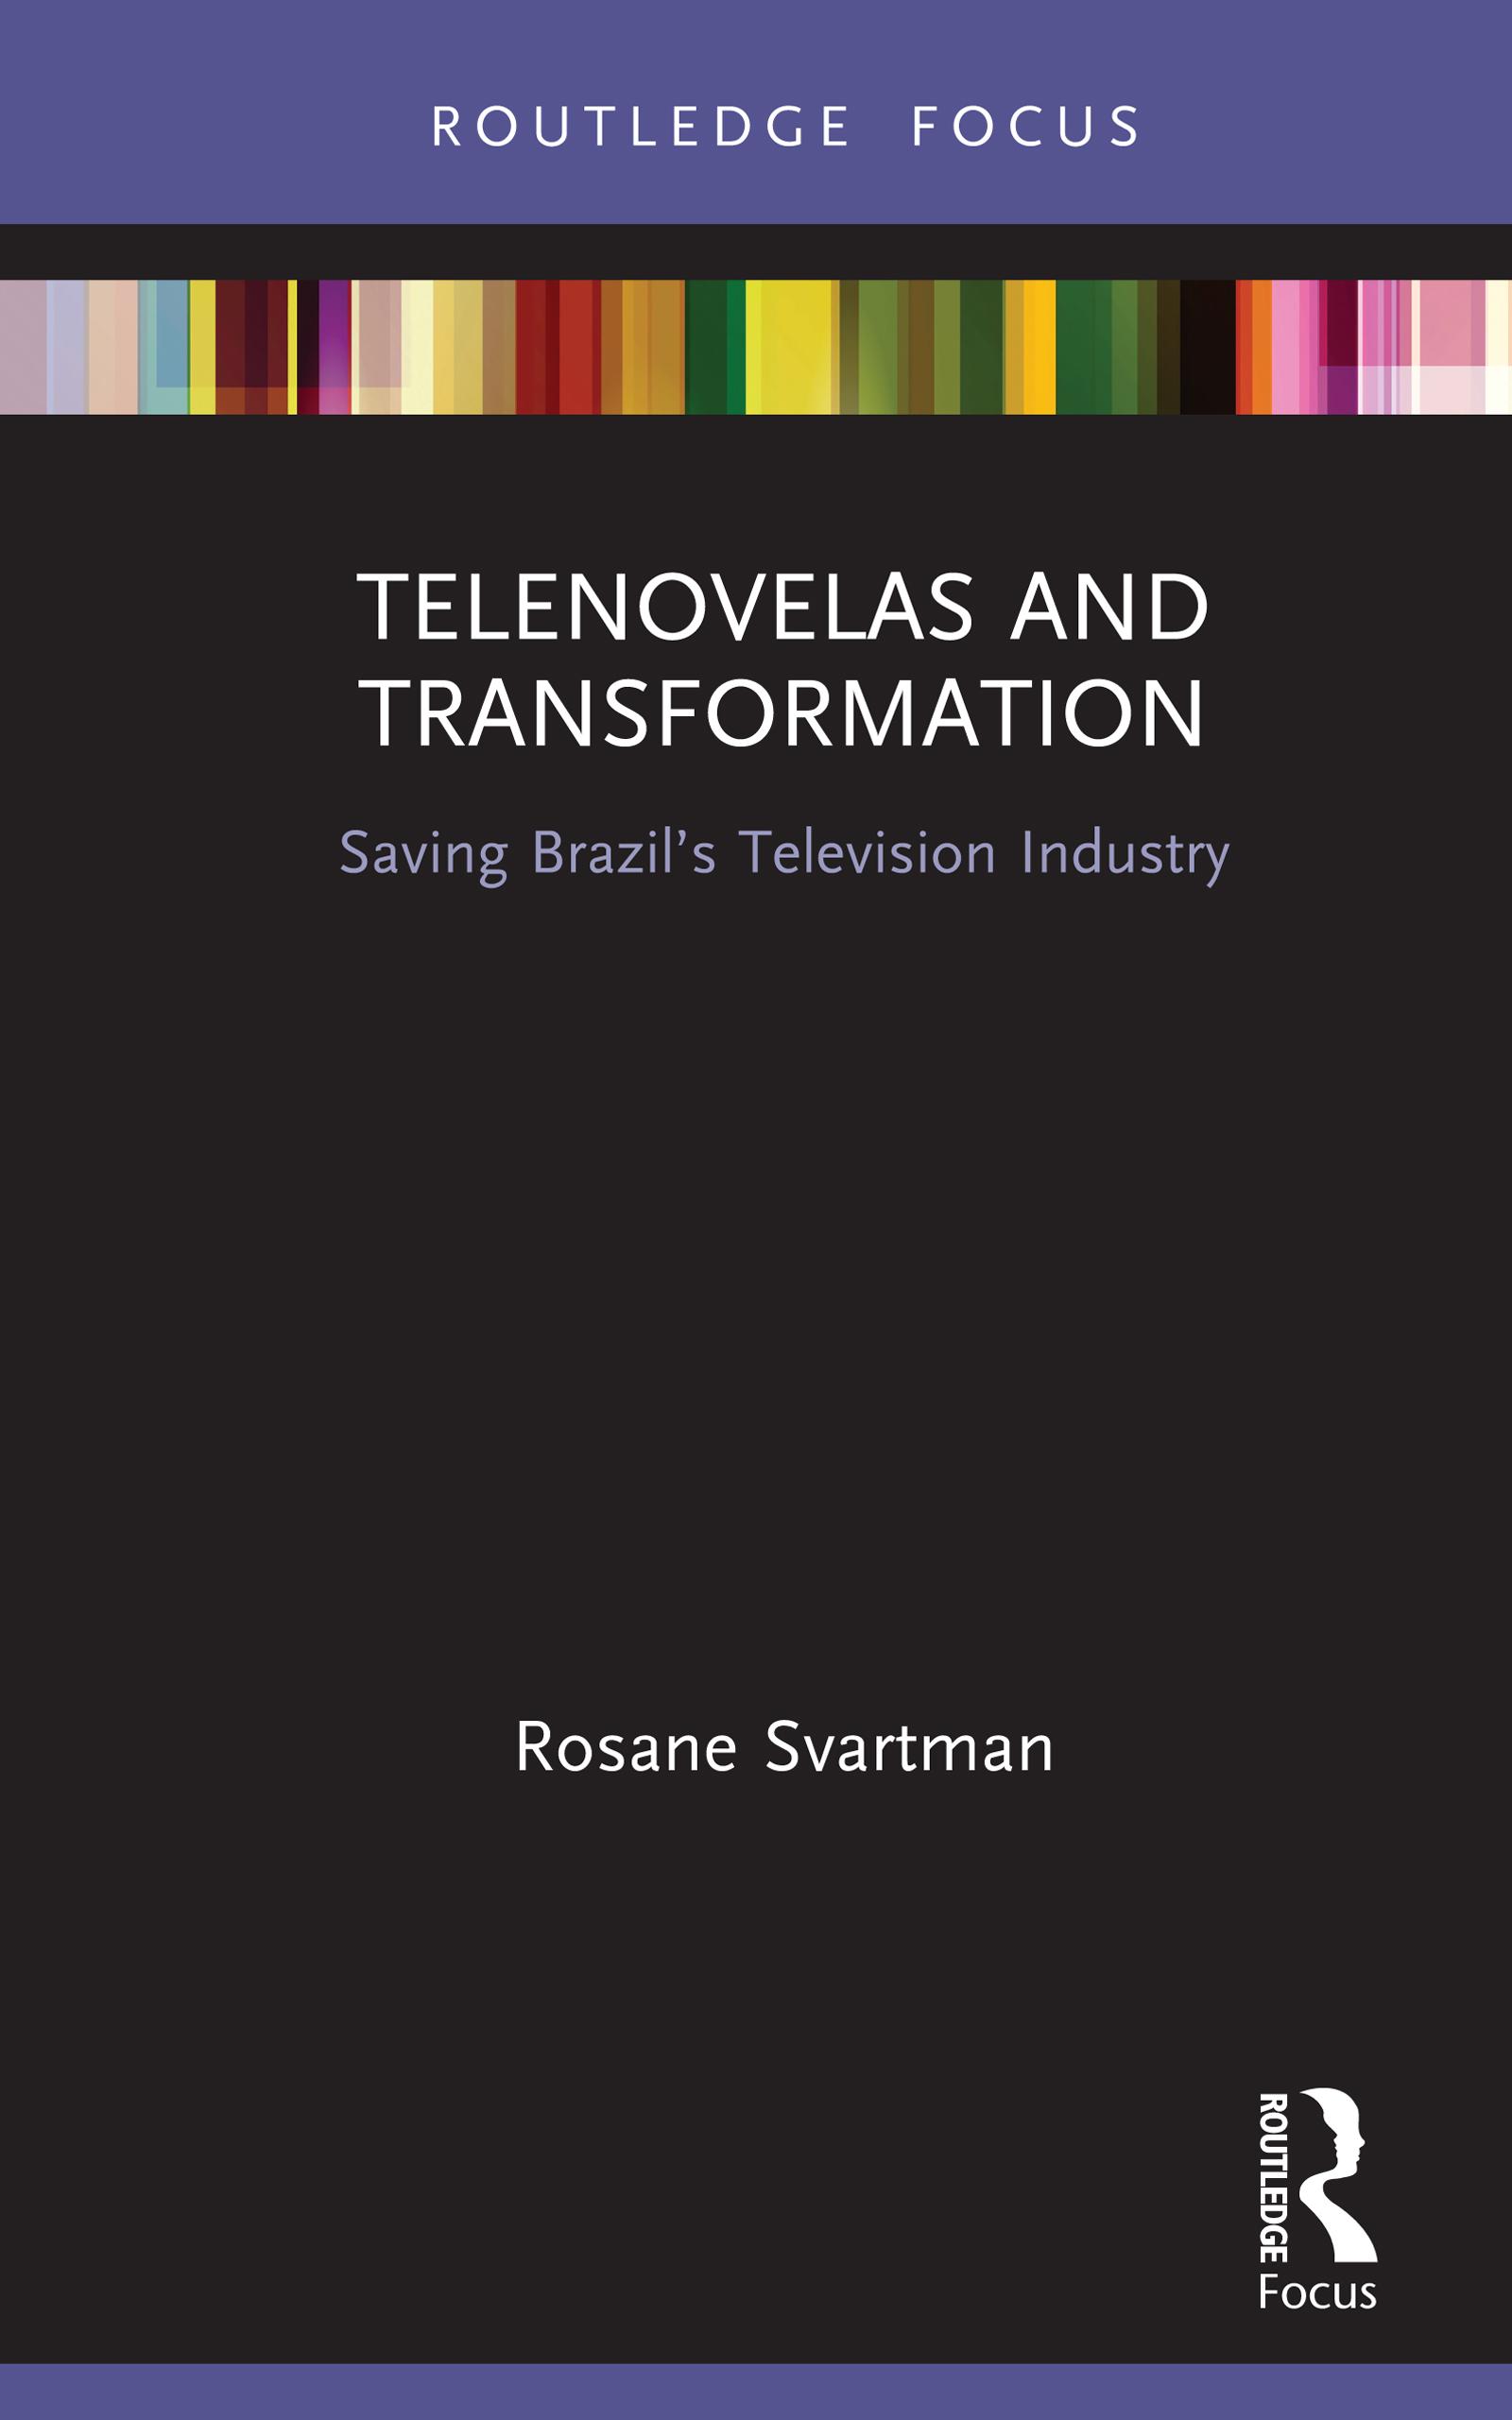 Telenovelas and Transformation